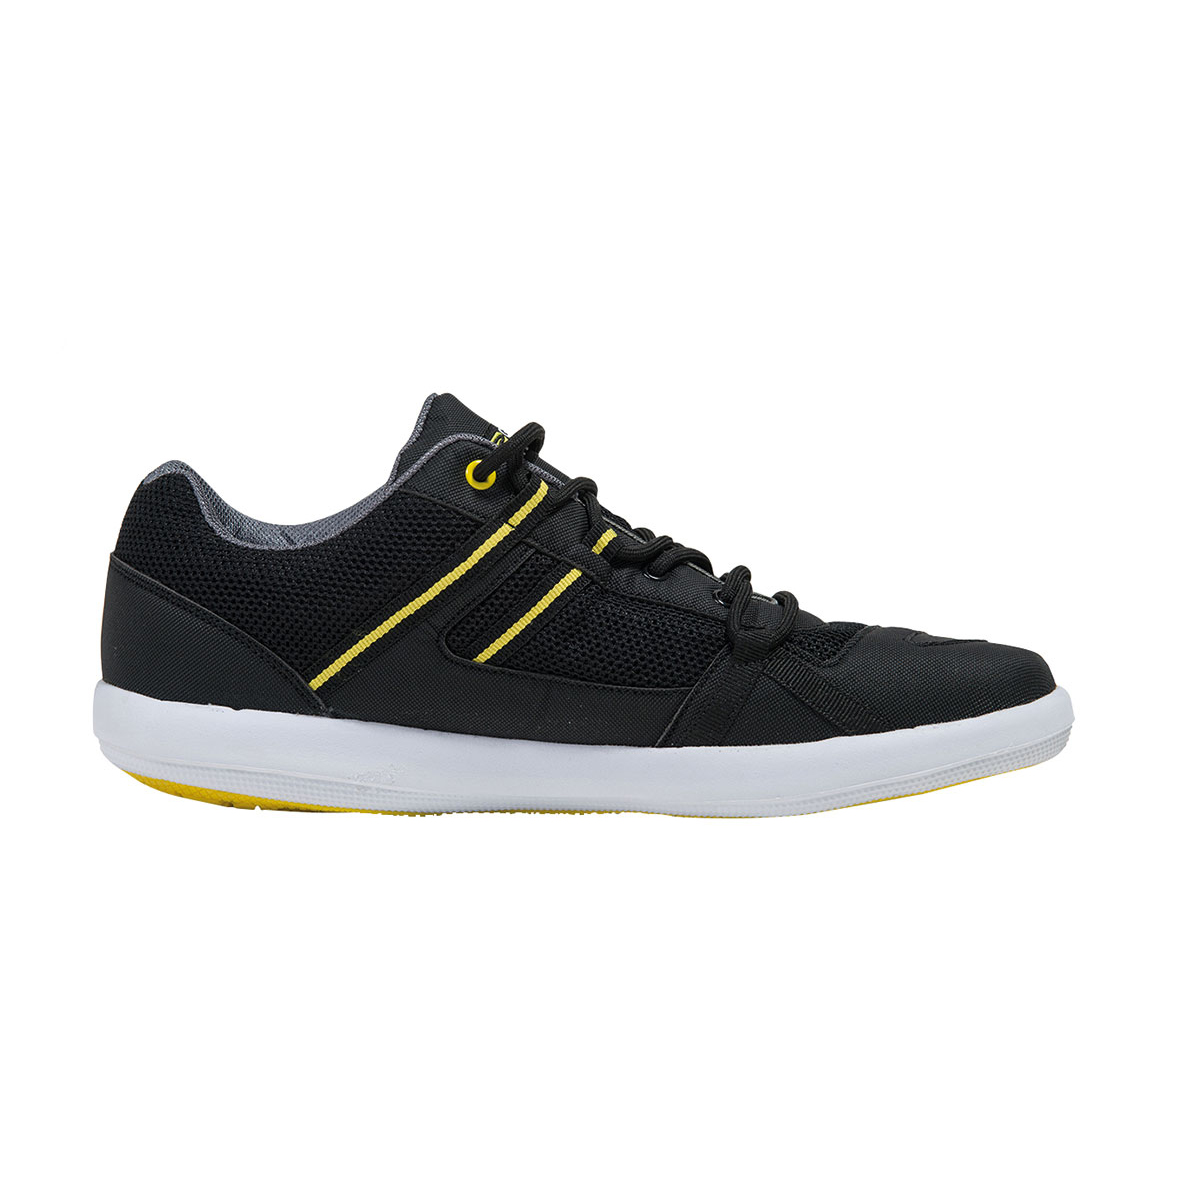 Gul Aqua Grip Hydro Shoes 2018 Black Yellow Cyber